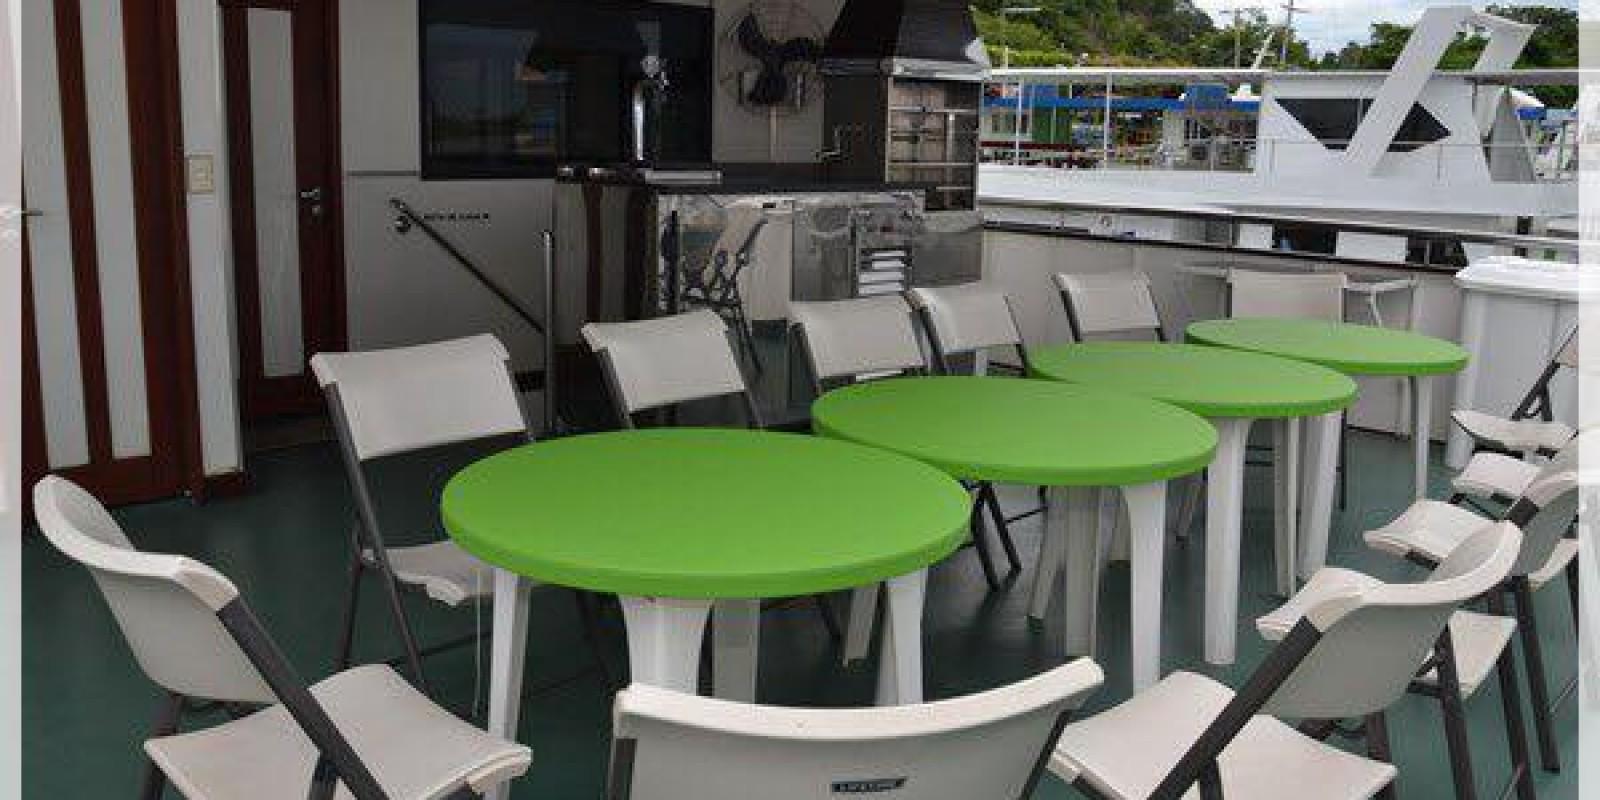 BARCO HOTEL ALMIRANTE / CORUMBA - Foto 3 de 11